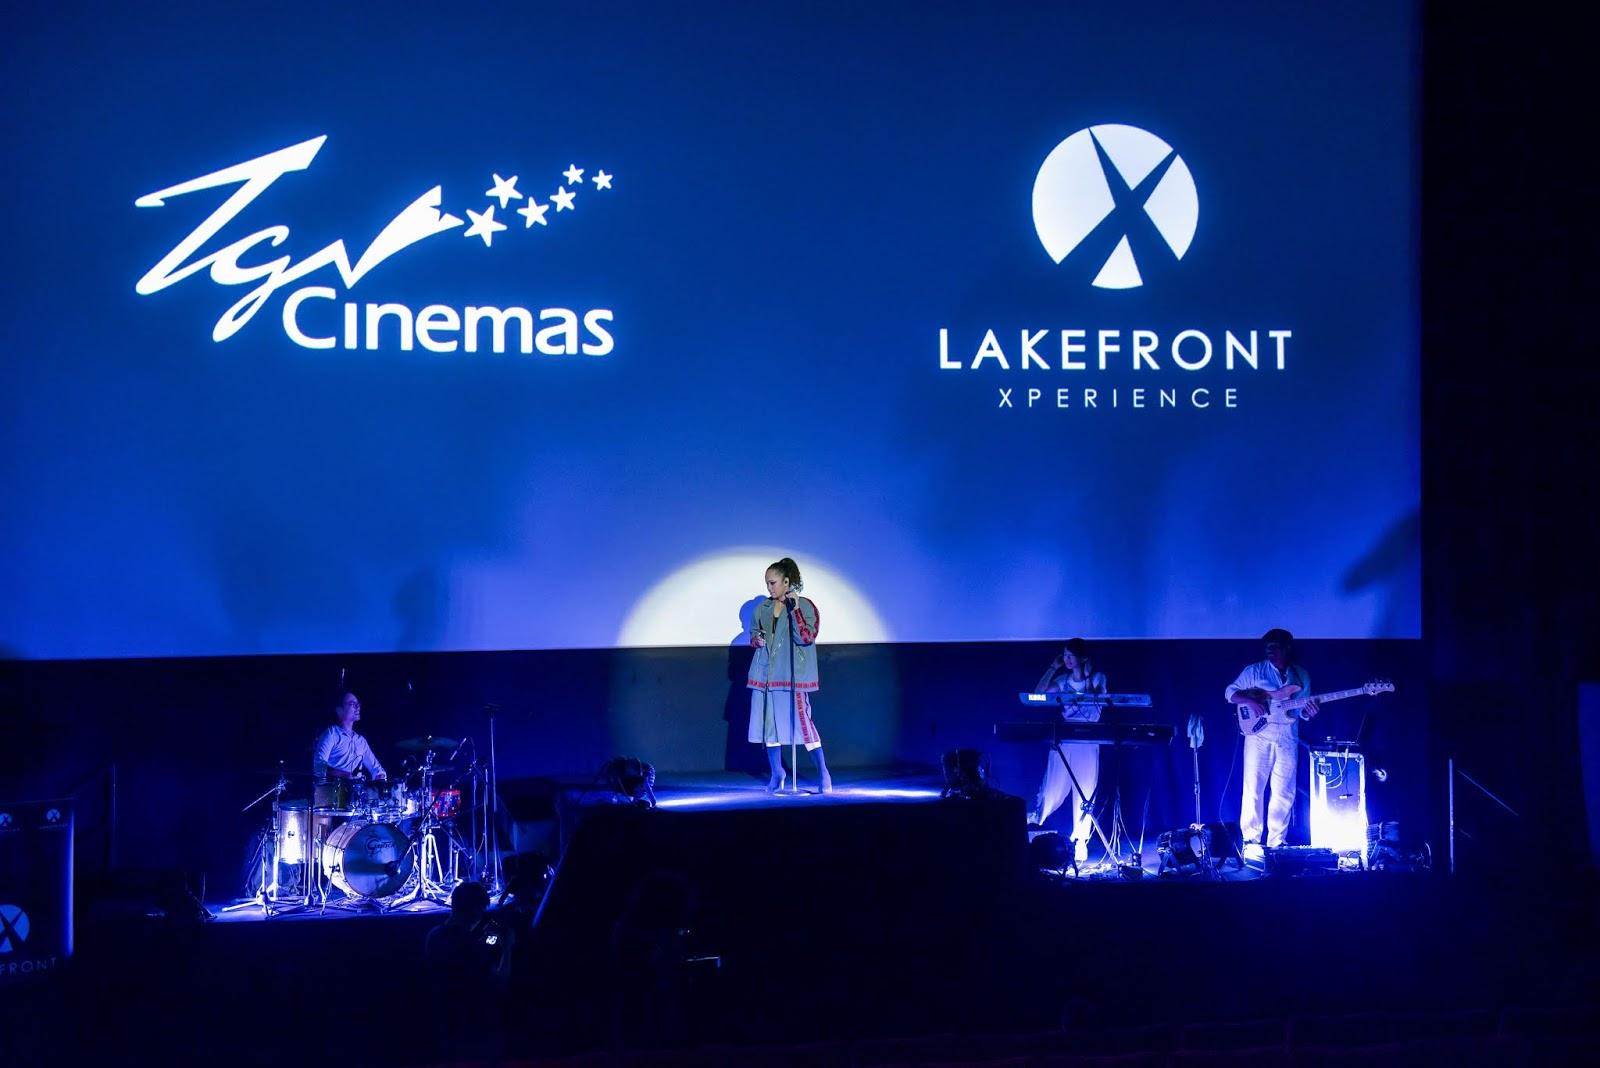 DboystudioMakan: TGV Cinemas X Lakefront Xperience - World